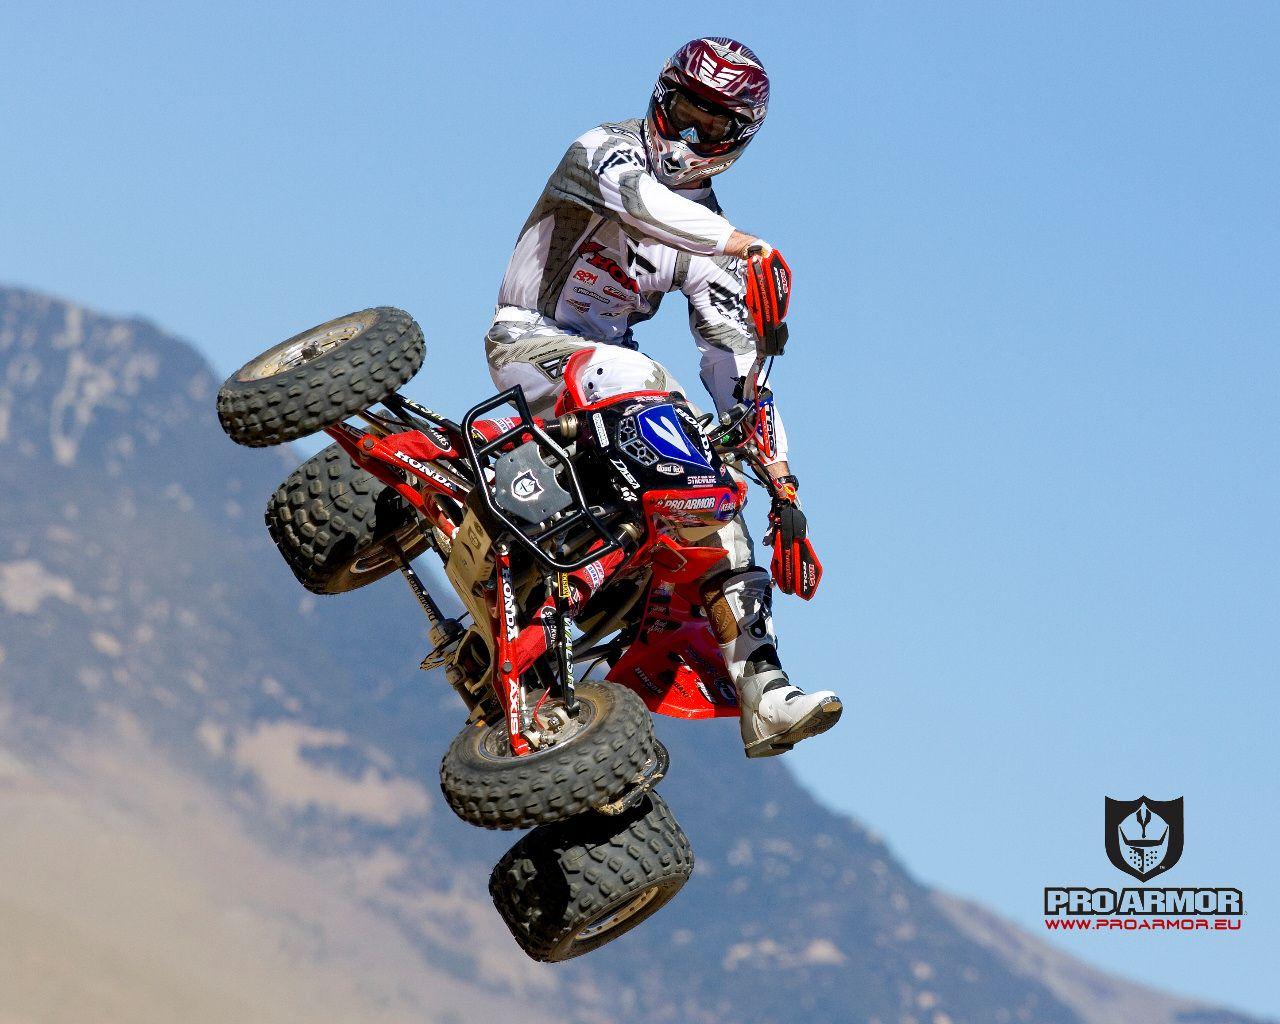 20 best jump images on pinterest dirtbikes dirt biking and k resolution wallpaper atv